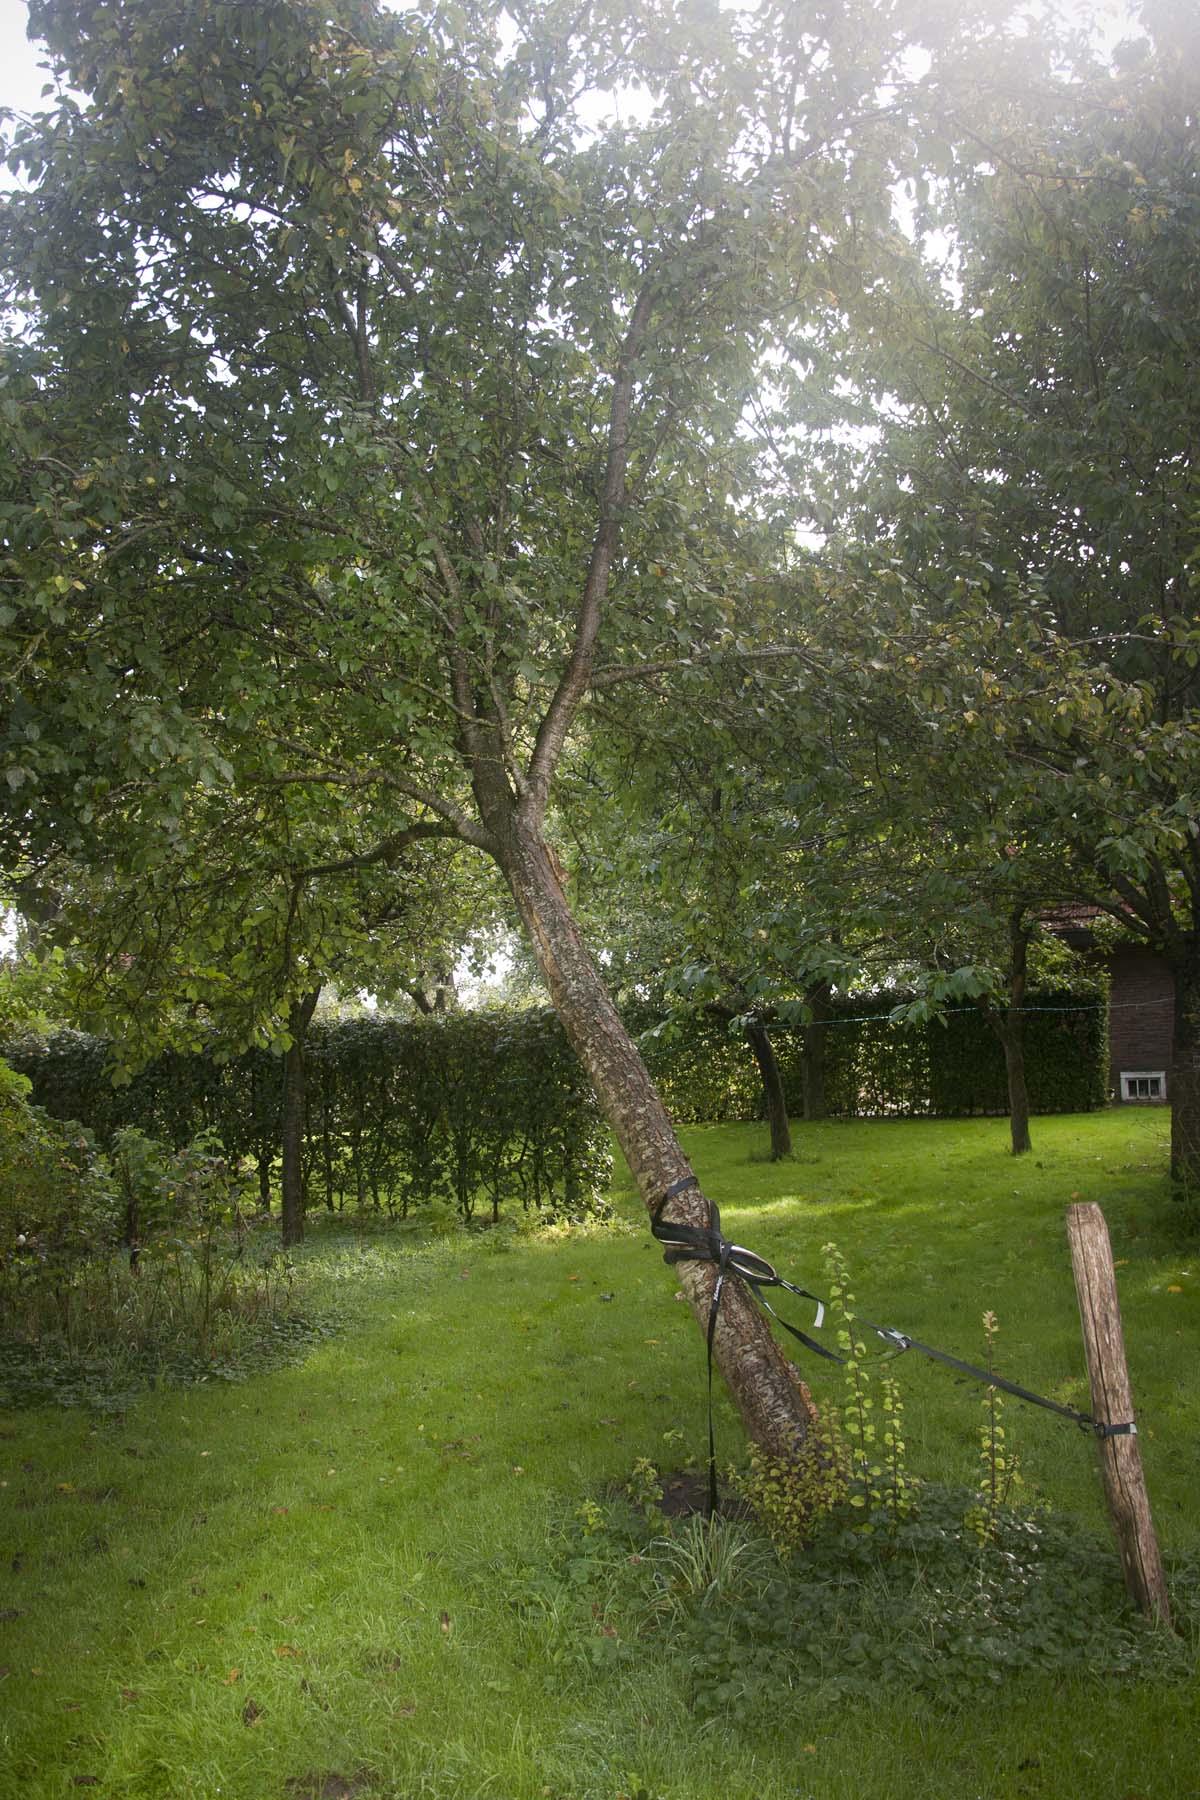 2015 09 19 HSB Steenwijk 5966